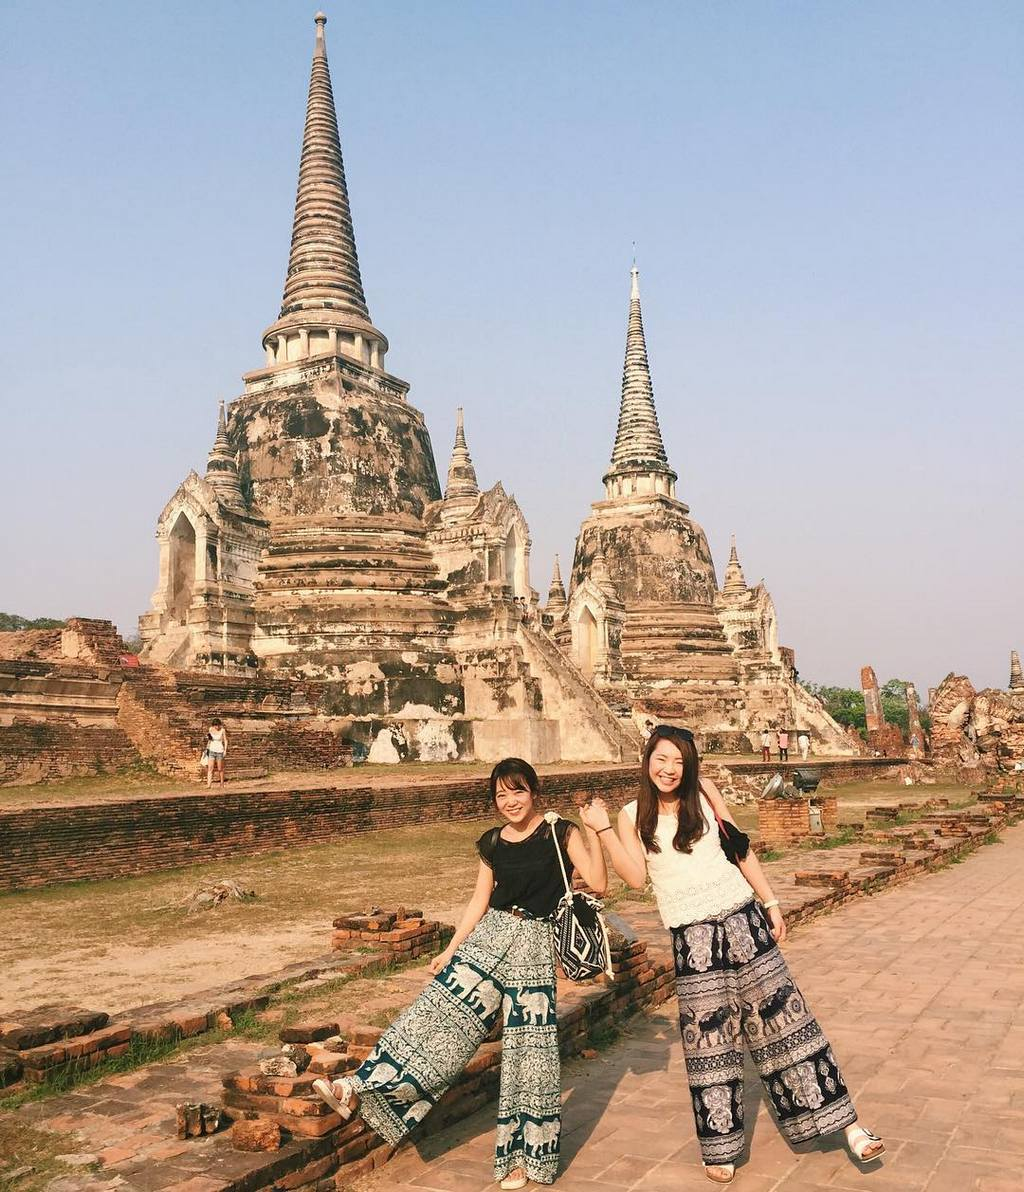 Ayutthaya thai history travel tip old temple friends girls must-go destination